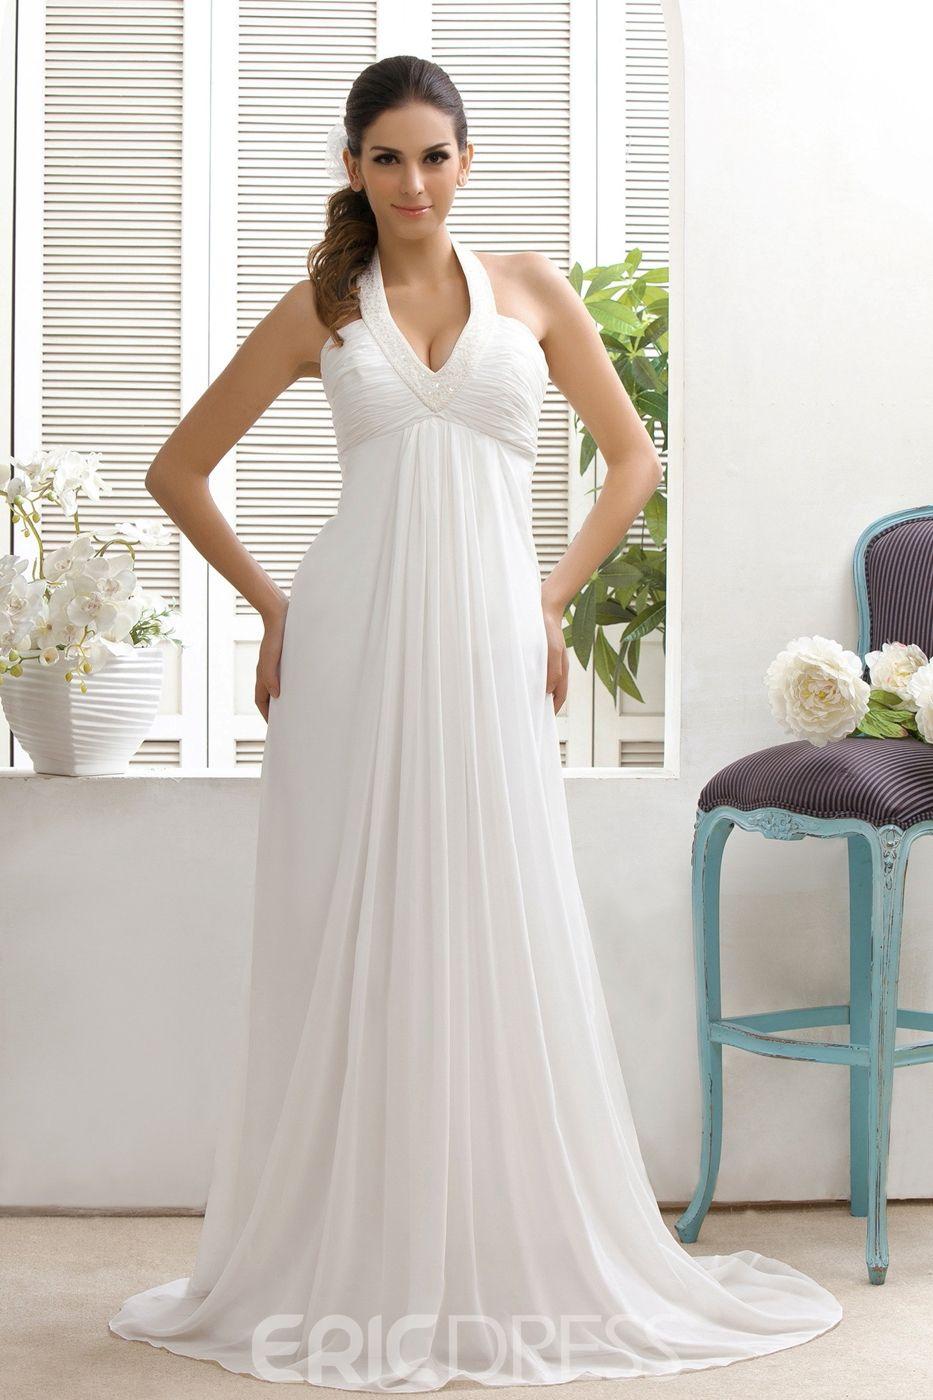 Chapel Wedding Dresses Plus Size Under 100 Dress: Plus Size Short Halter Wedding Dresses At Reisefeber.org